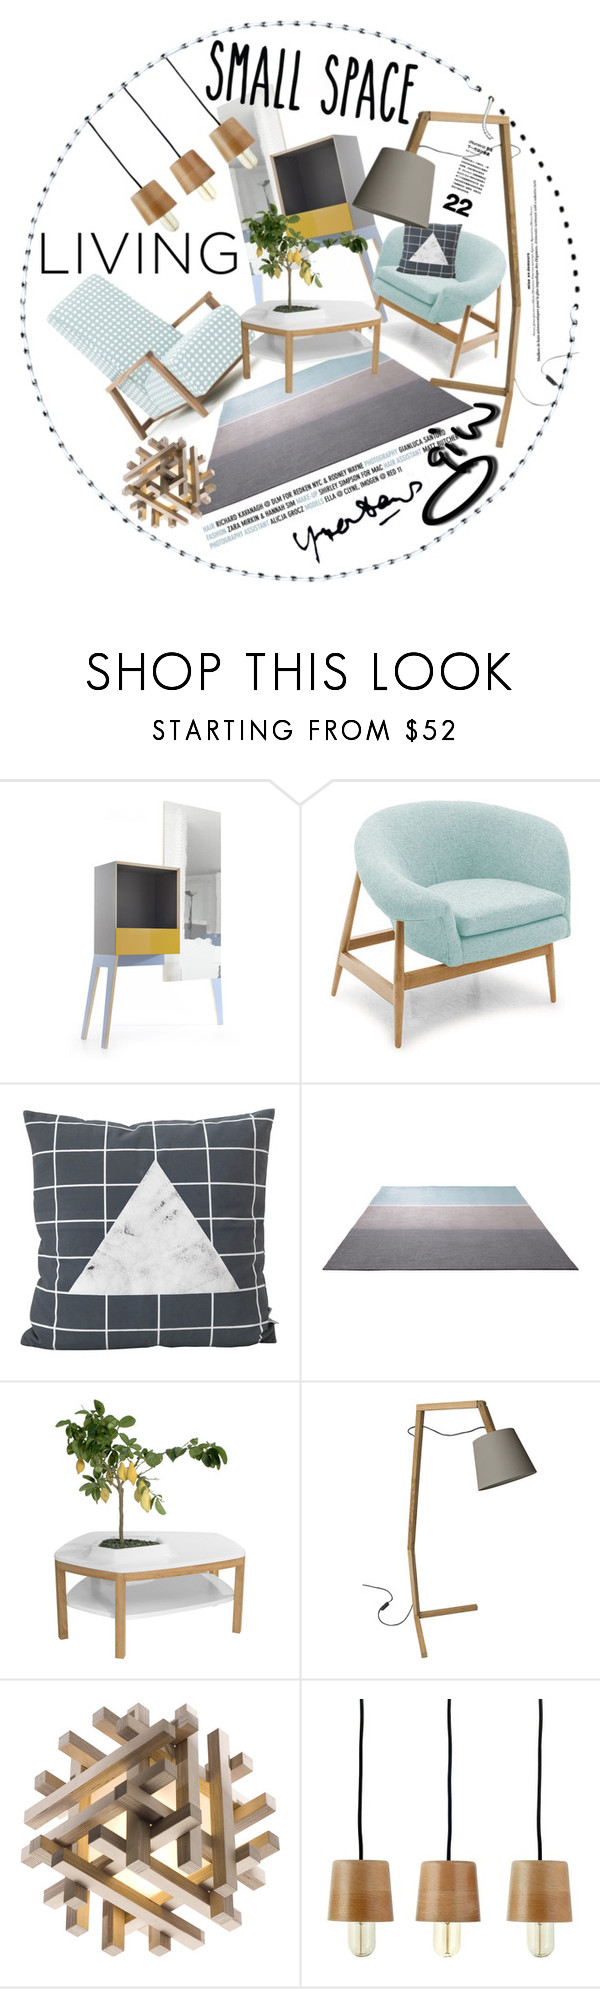 """22..."" by ian-giw ❤ liked on Polyvore featuring interior, interiors, interior design, home, home decor, interior decorating, Dansk, Joybird Furniture, Studio LileSADI and ESPRIT"